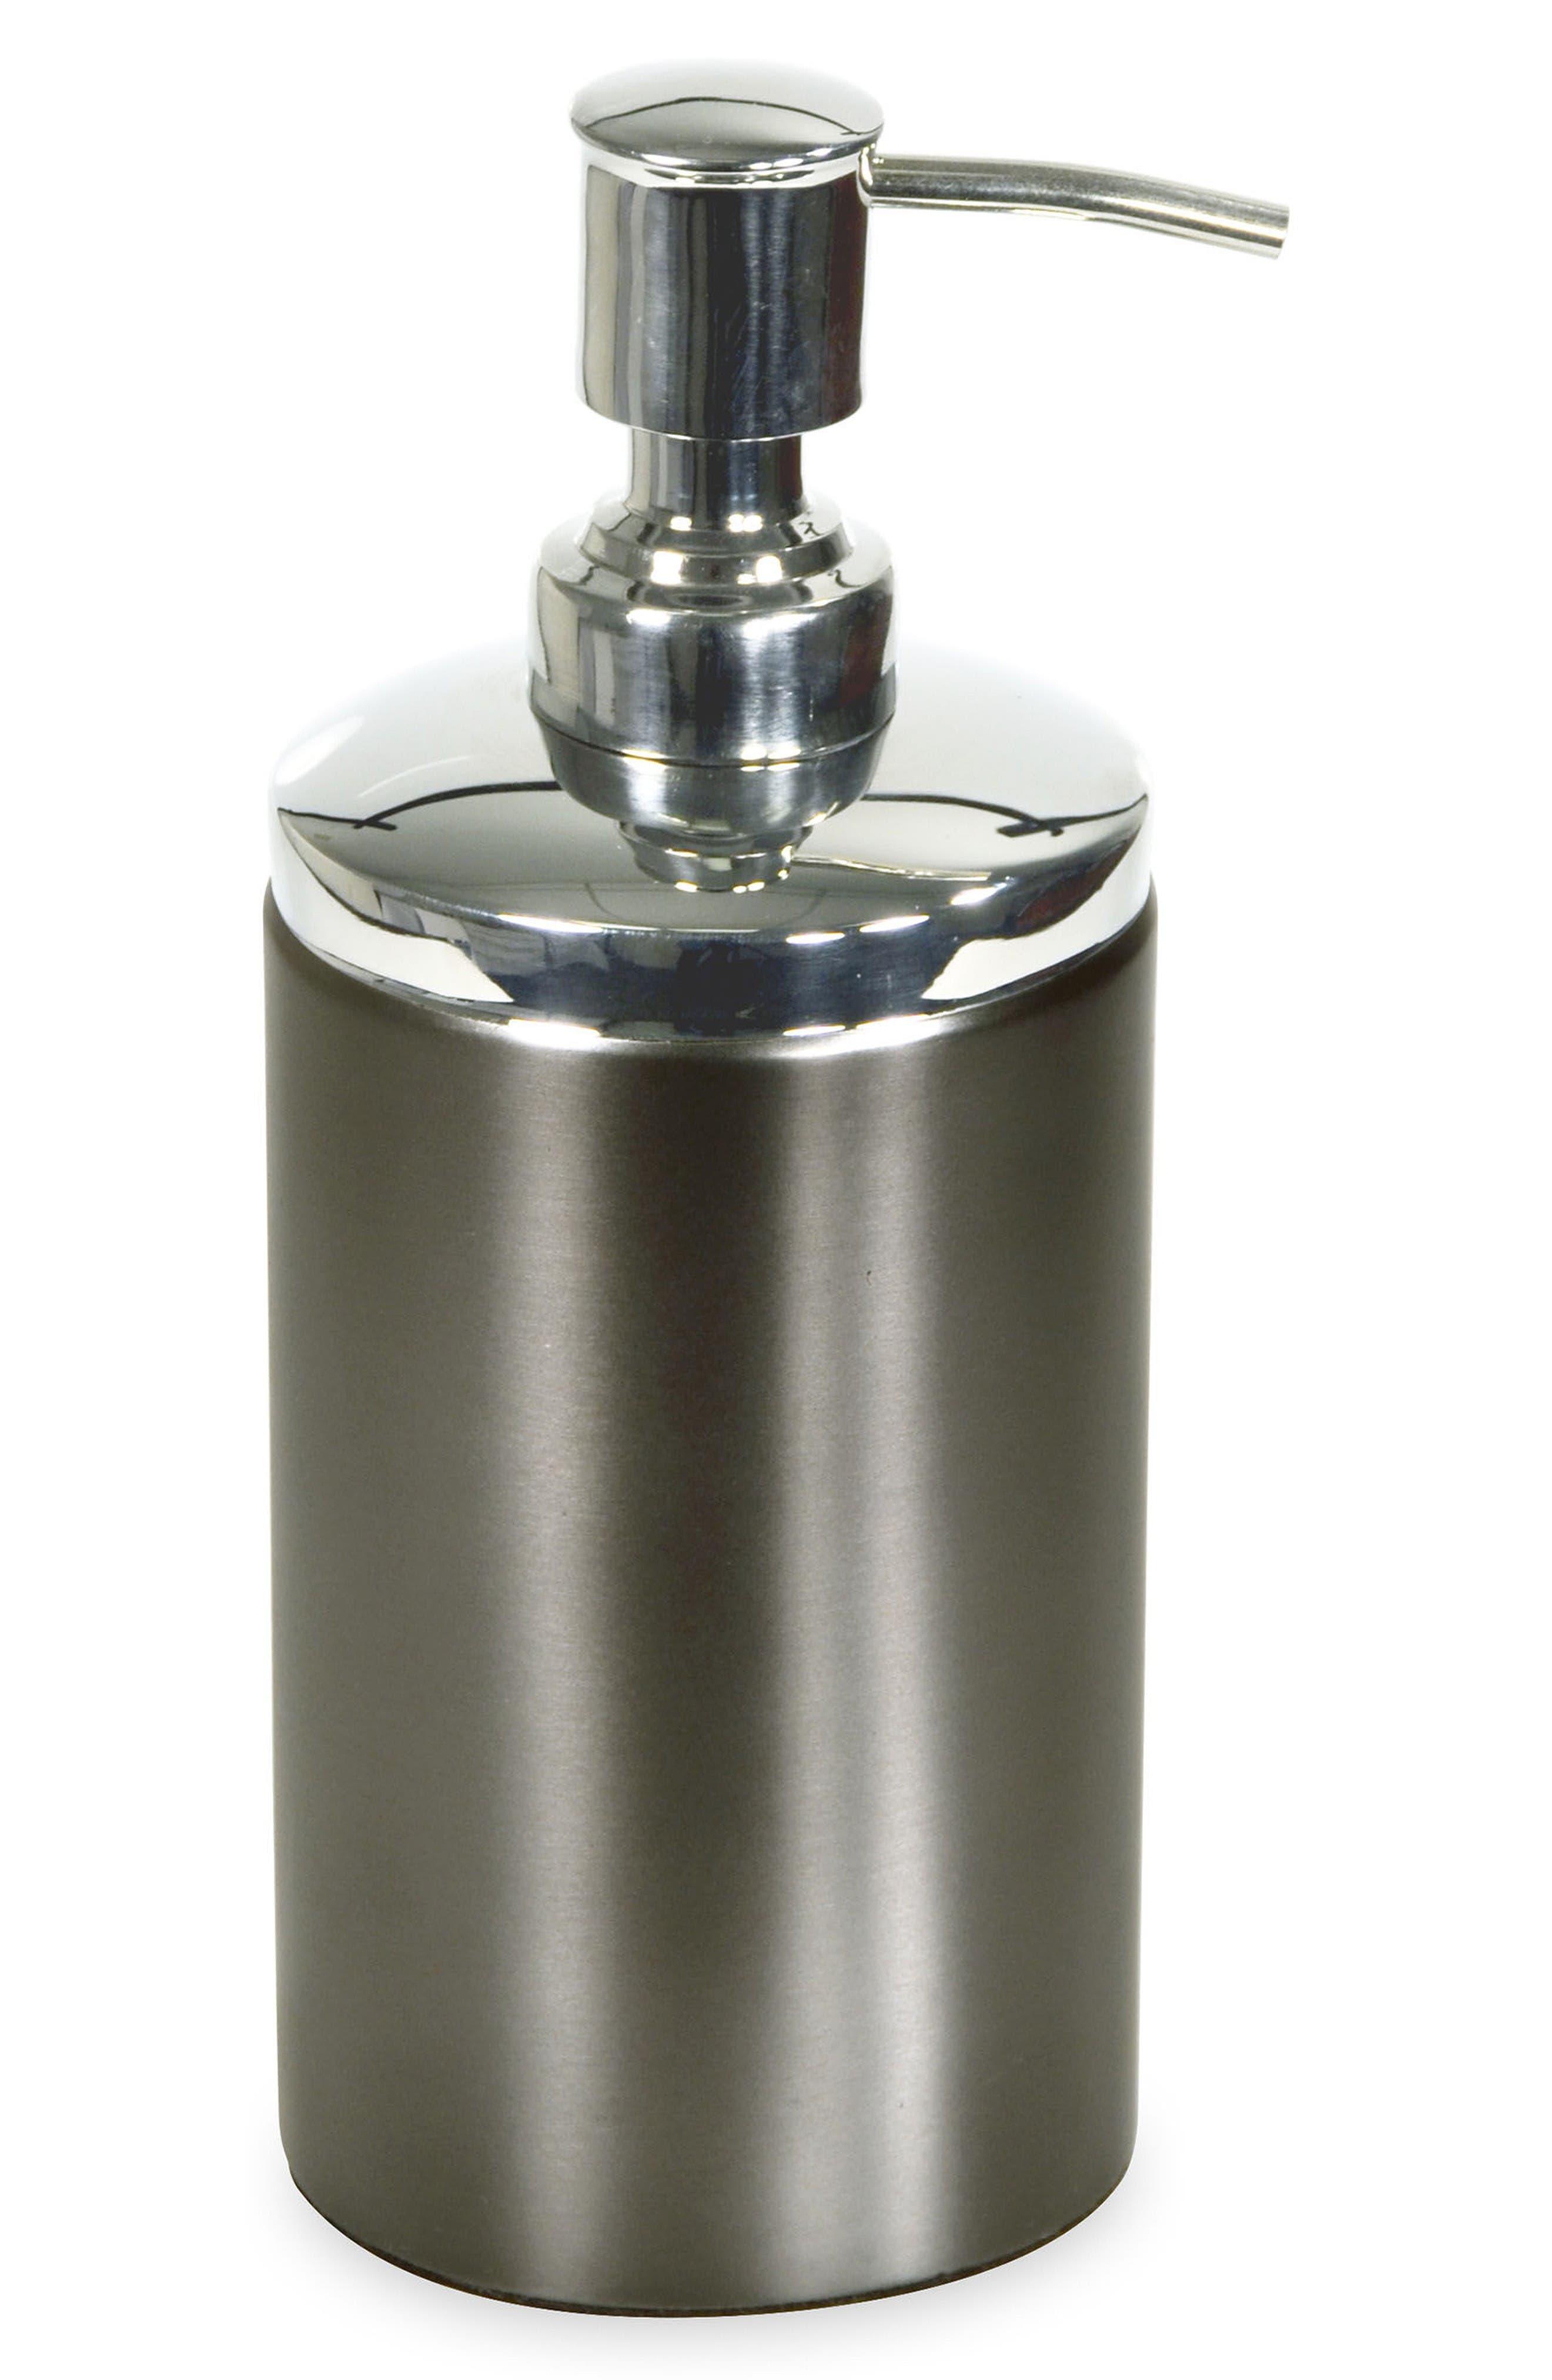 DKNY Astor Place Lotion Pump